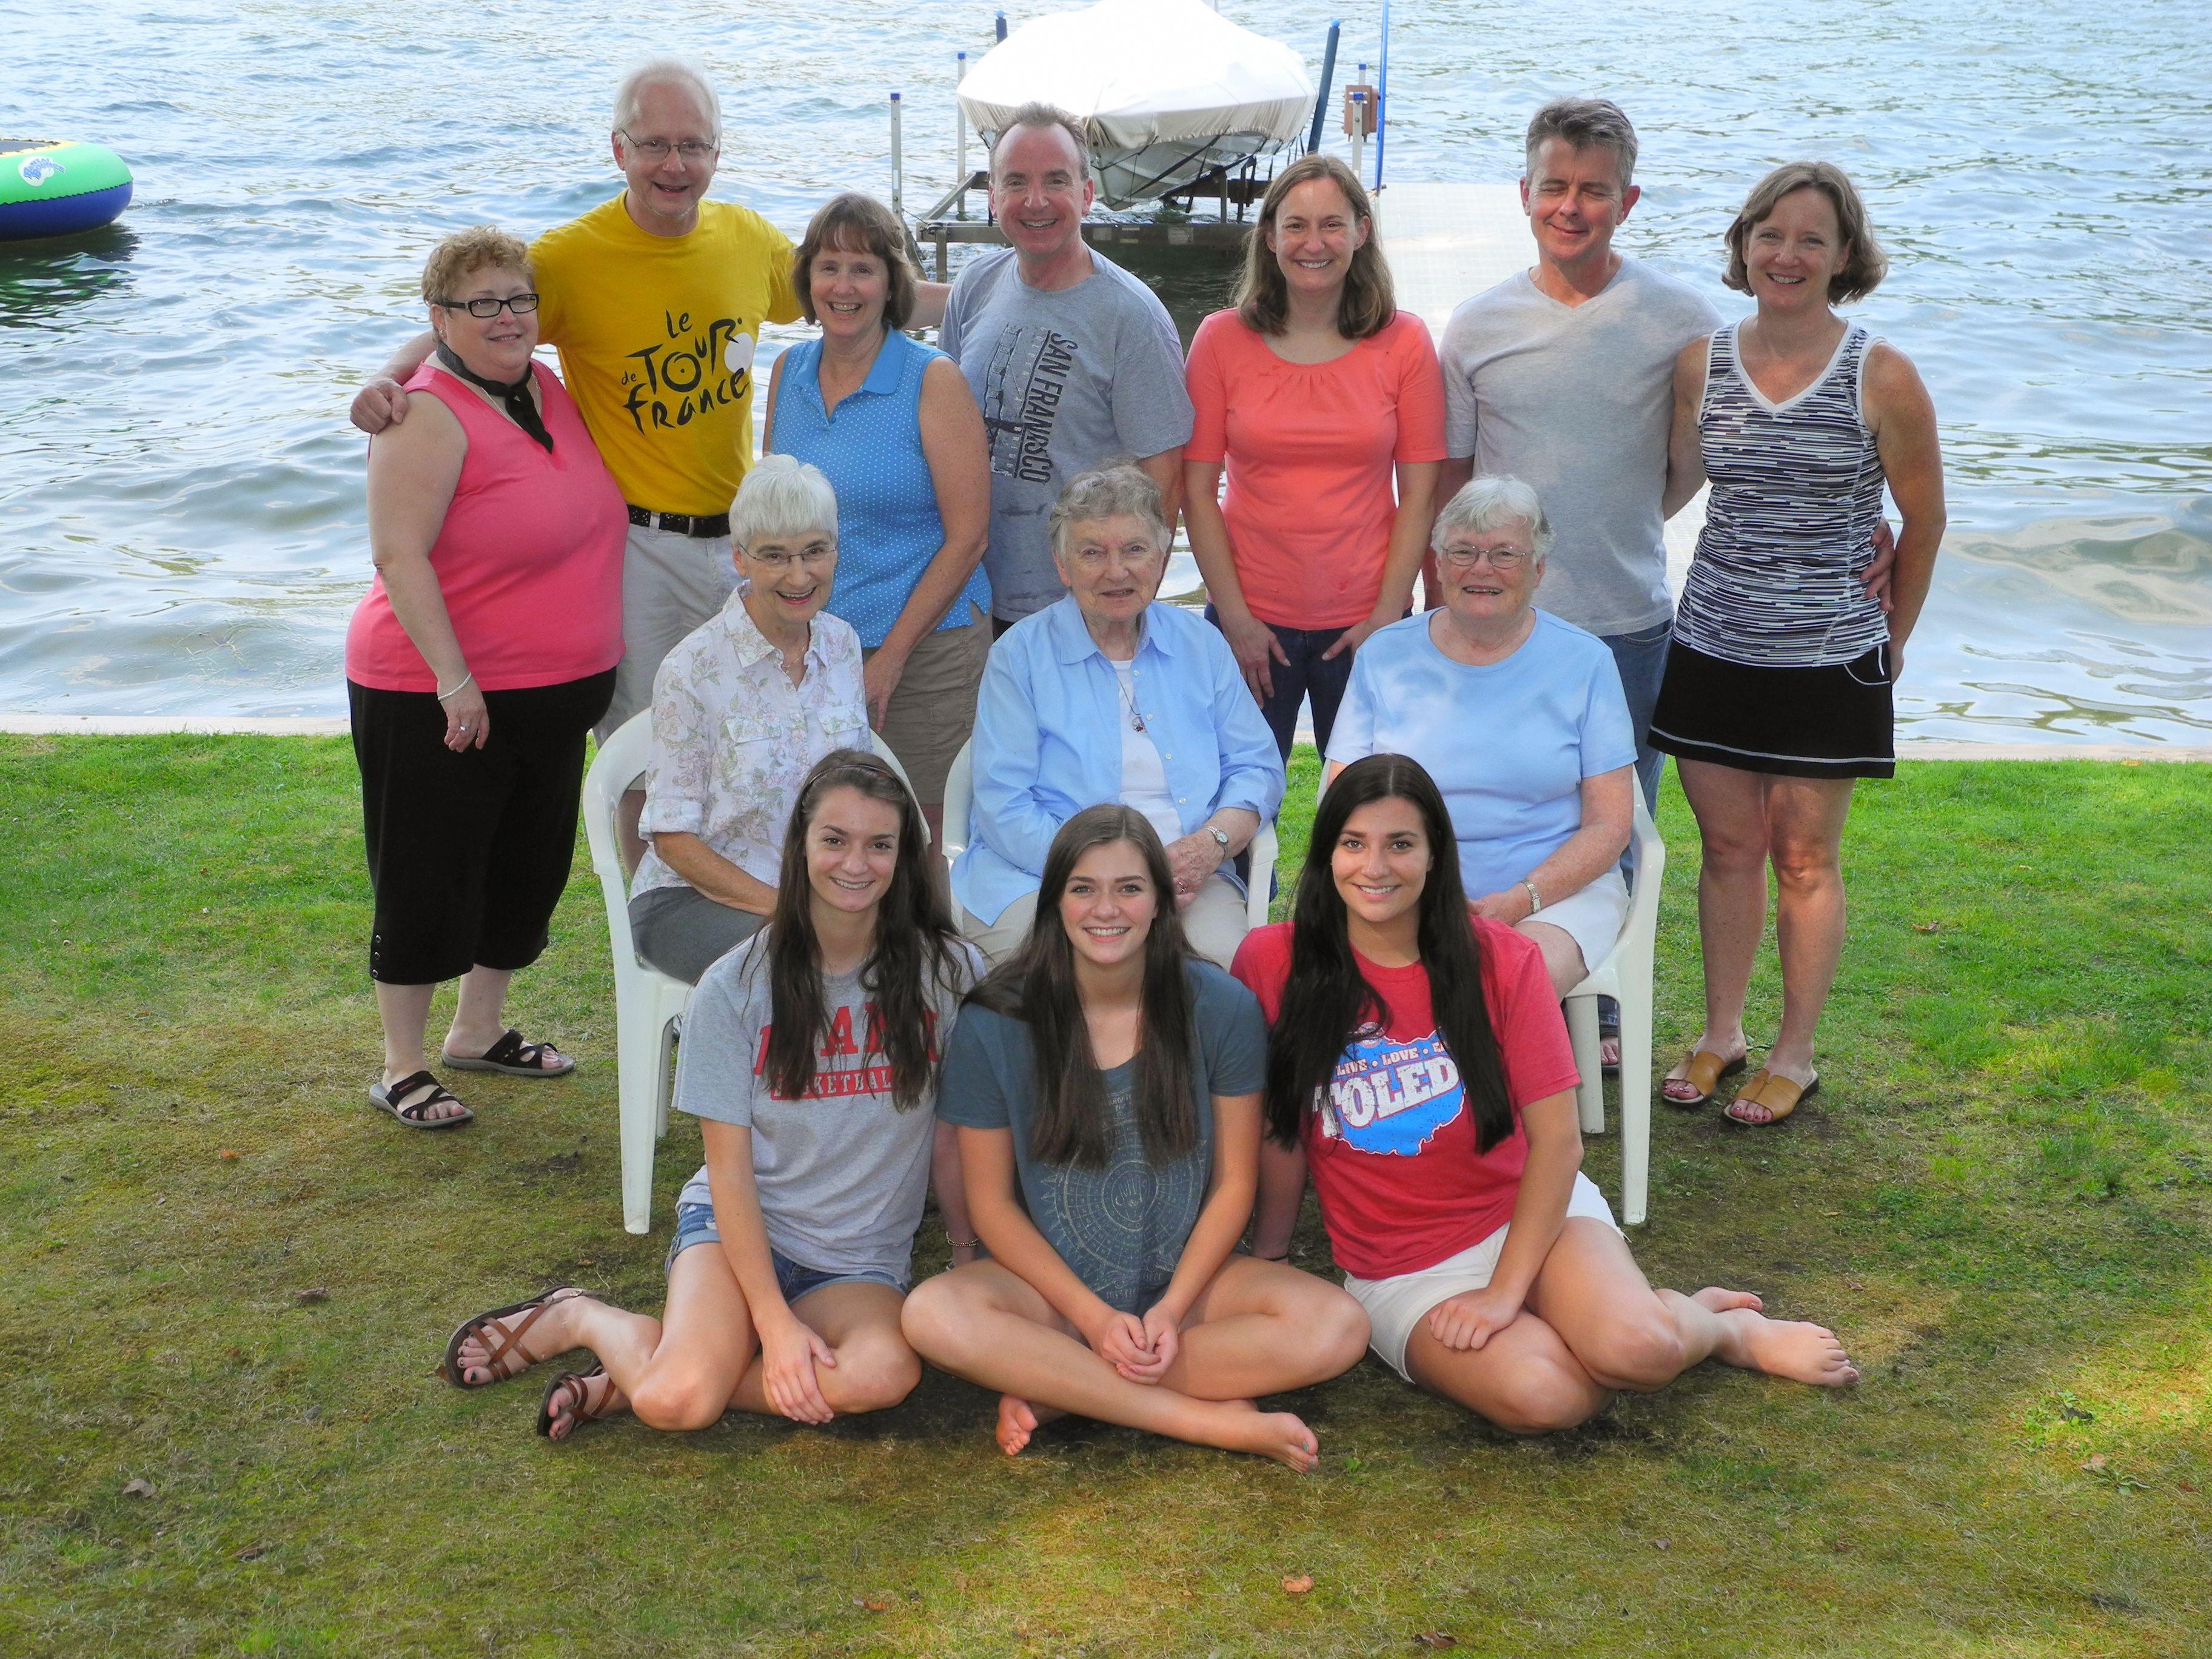 Family reunion michigan sept 2015 family reunion my